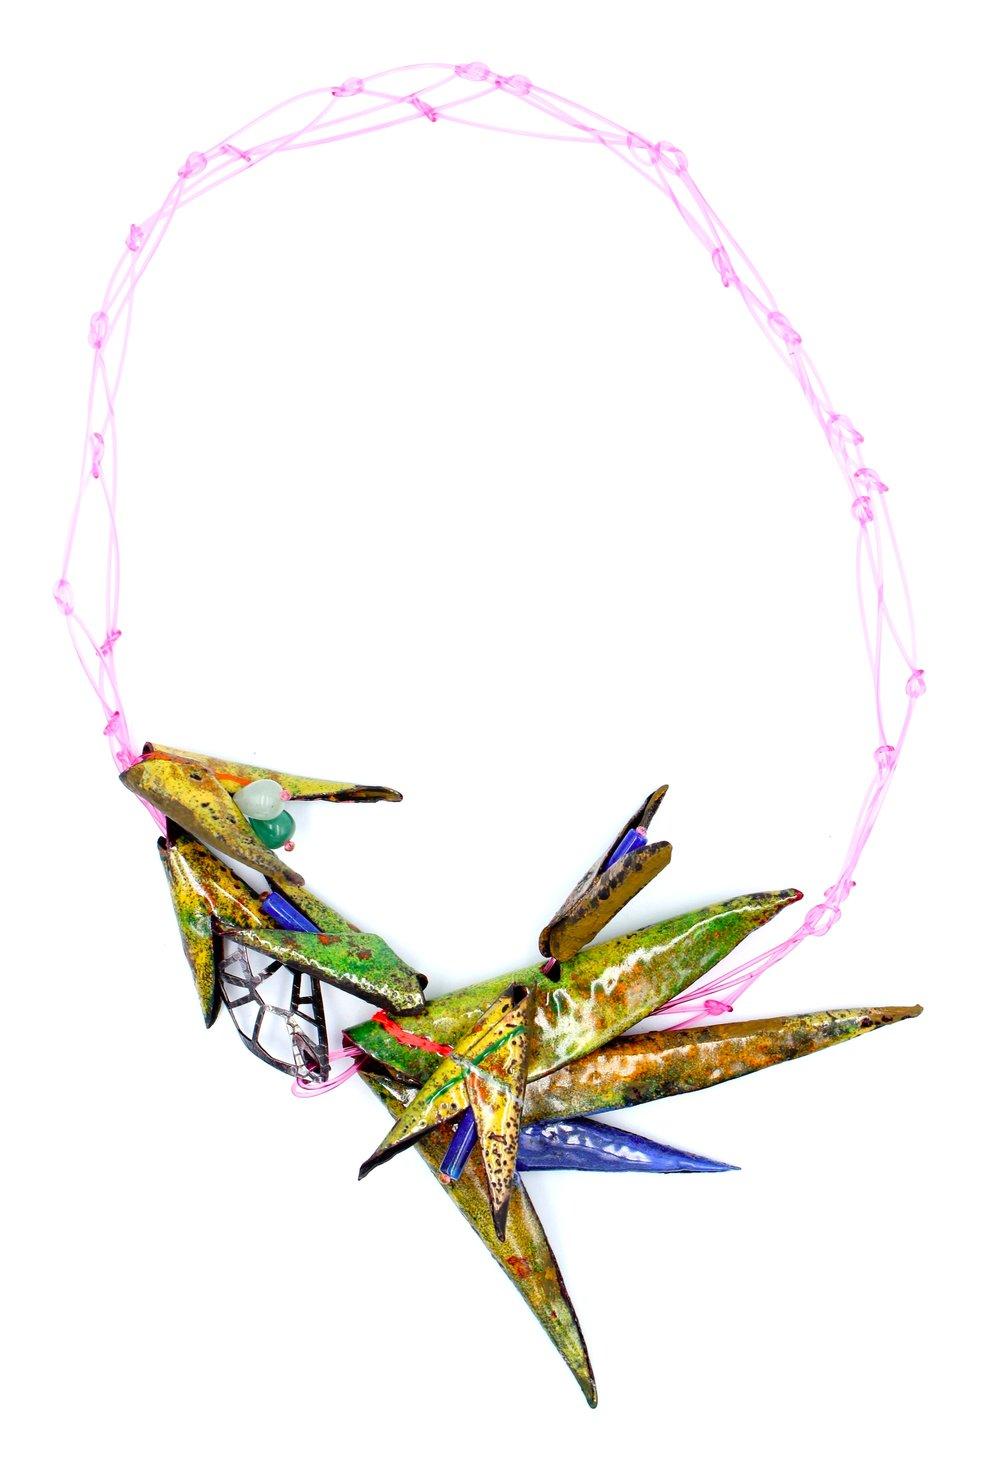 Vlamlek. 2019. Enamel, copper, sterling silver, nylon, silk, lapis lazuli, agate.